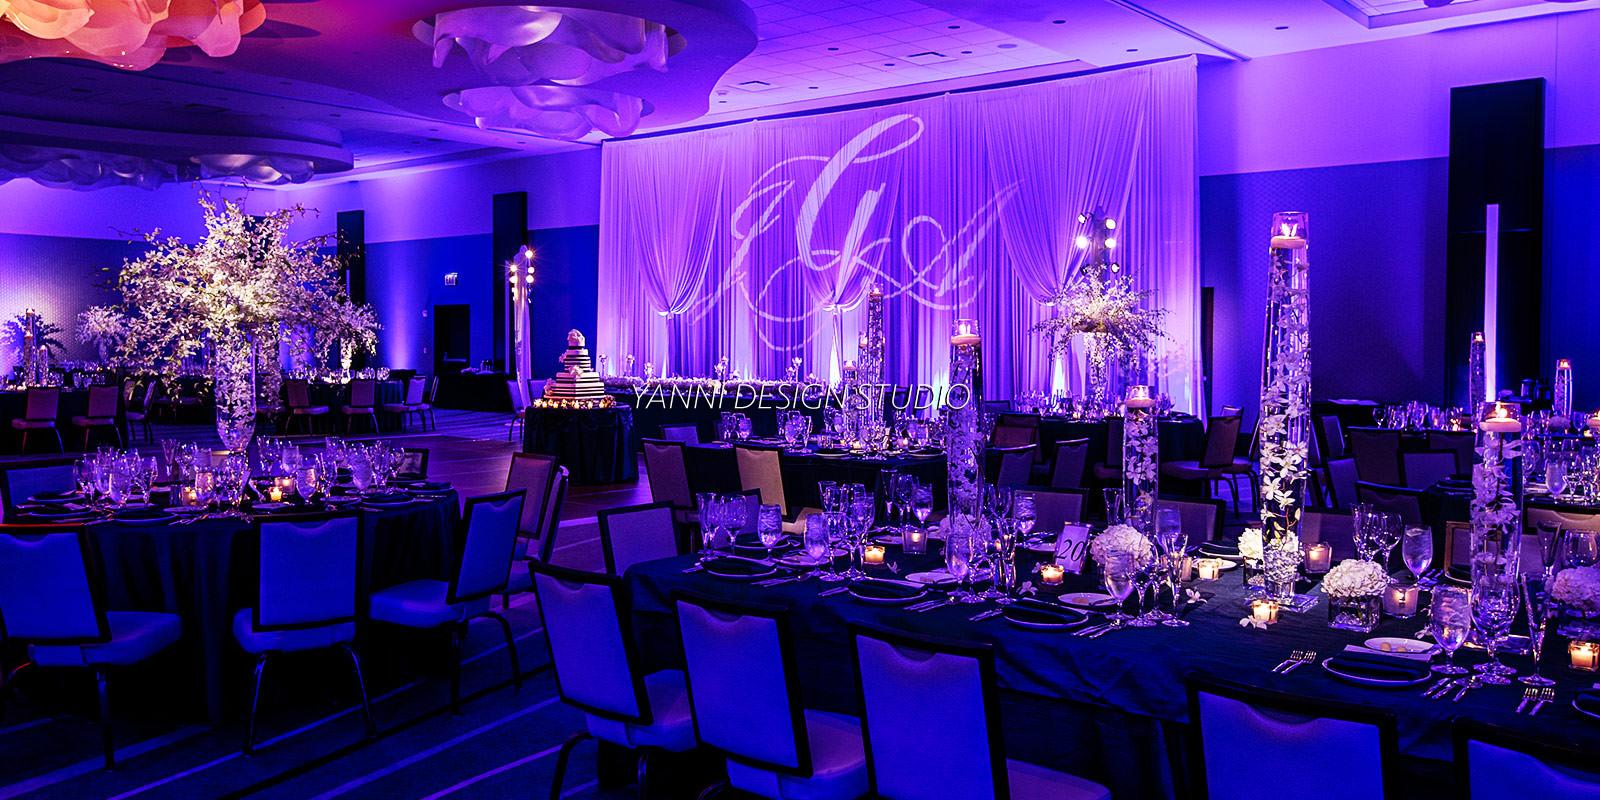 Wedding Flowers And Decorations Luxury Wedding Designers Wedding Reception Design Ballroom Wedding Reception Diy Wedding Decorations